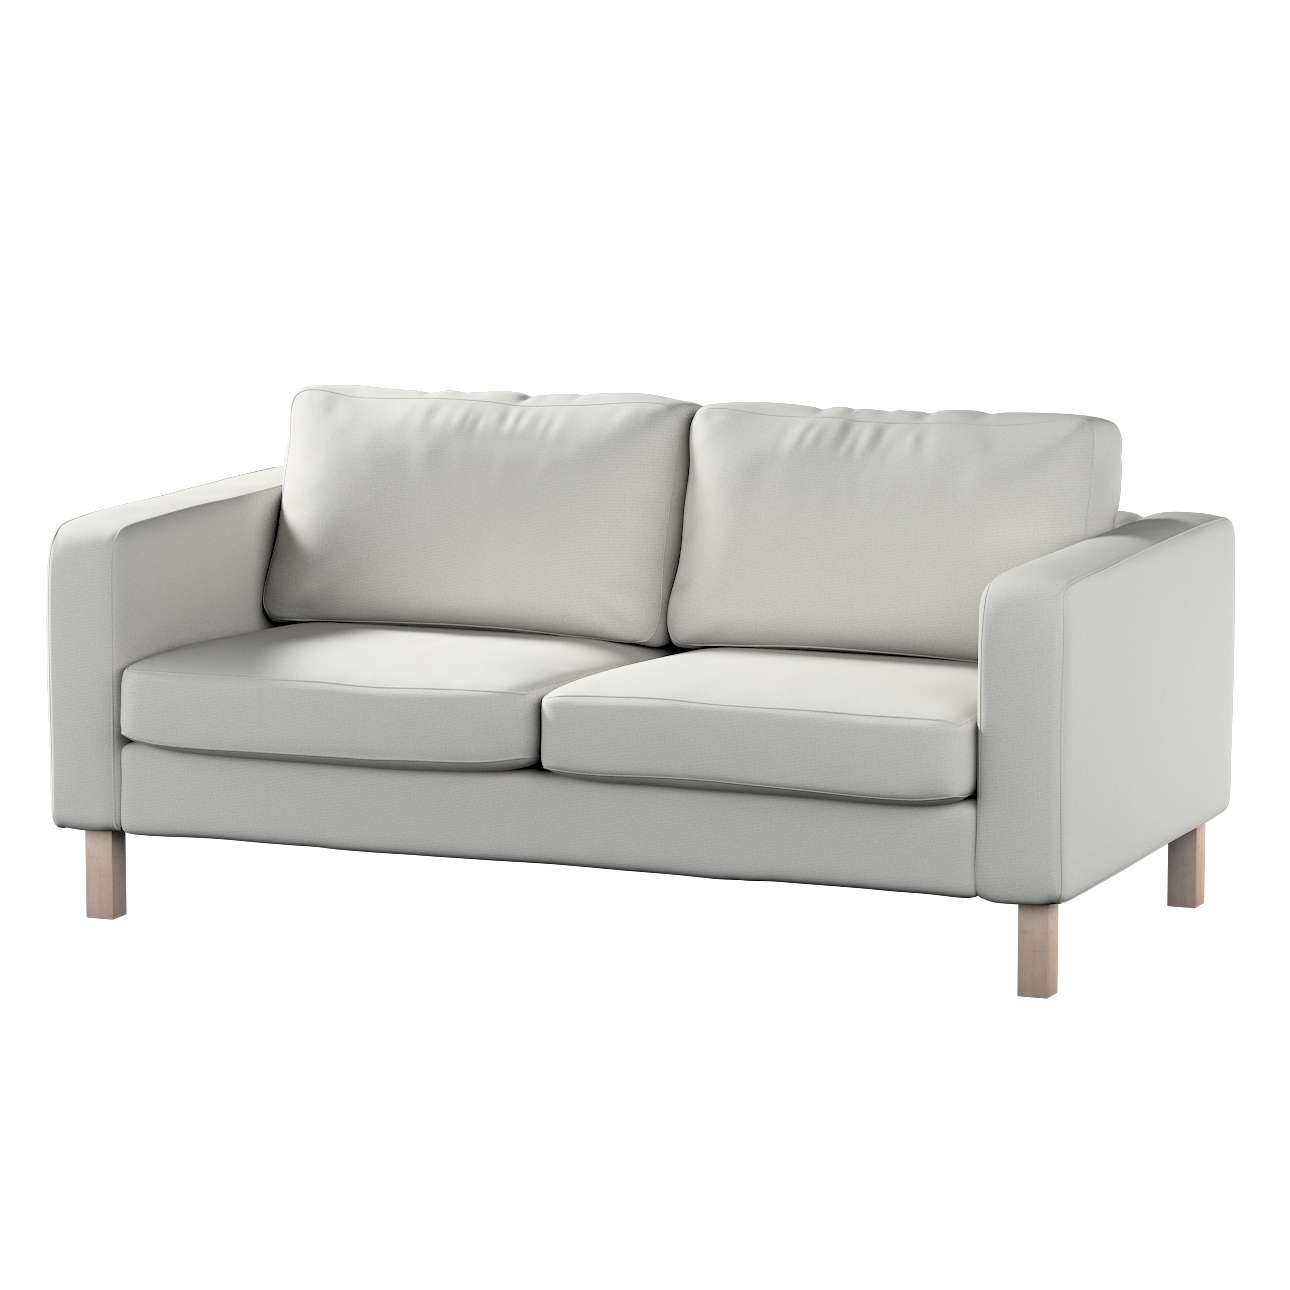 KARSLTAD dvivietės sofos užvalkalas Karlstad 2-vietės sofos užvalkalas kolekcijoje Etna , audinys: 705-90